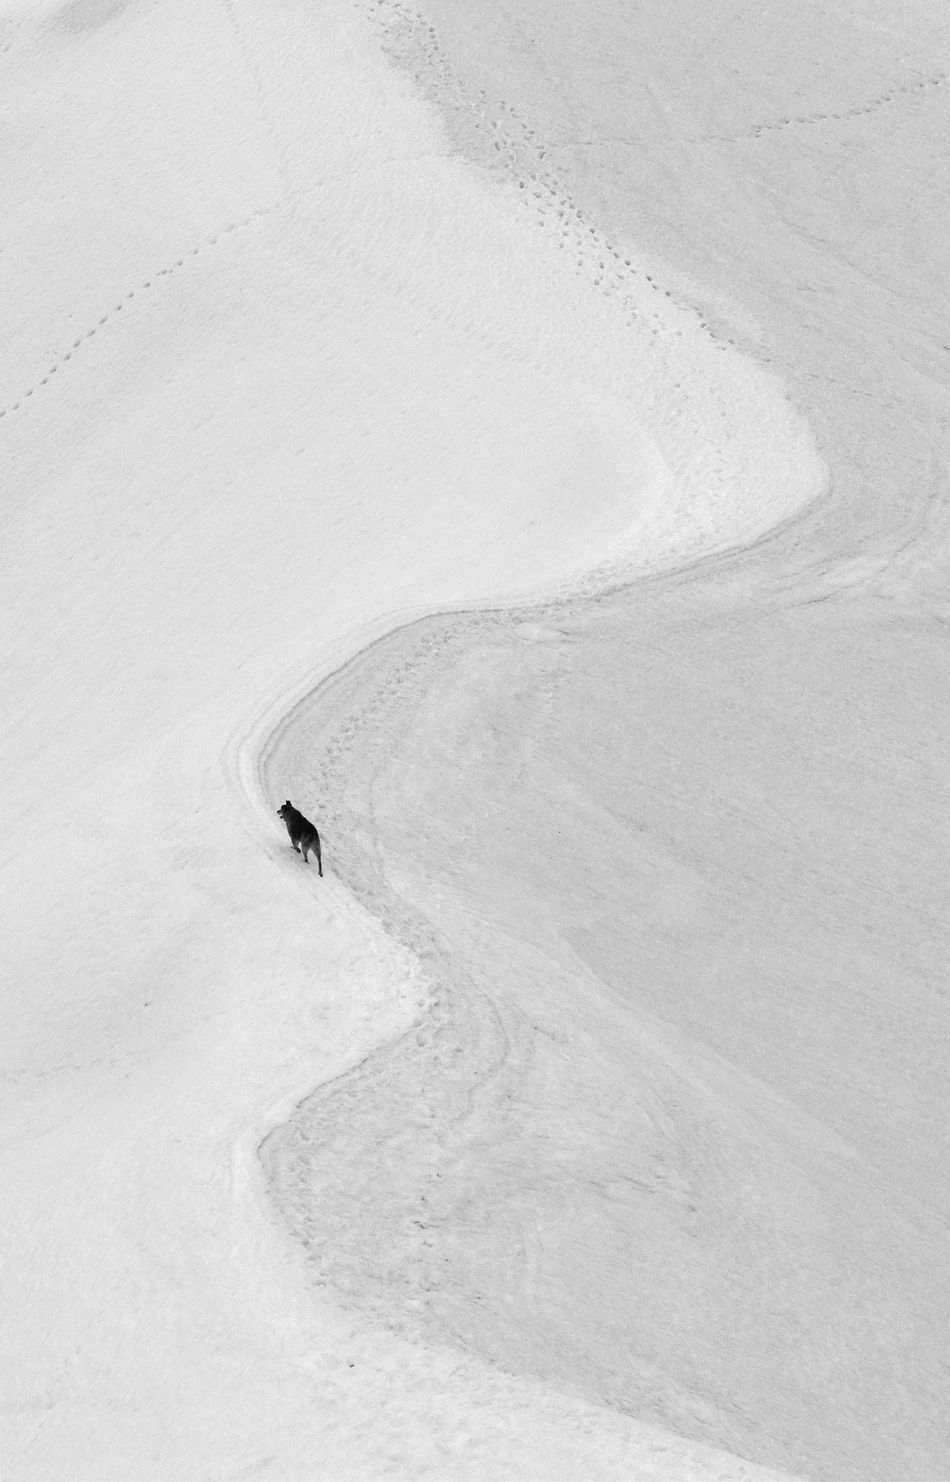 Beautiful stock photos of design, snow, winter, nature, high angle view